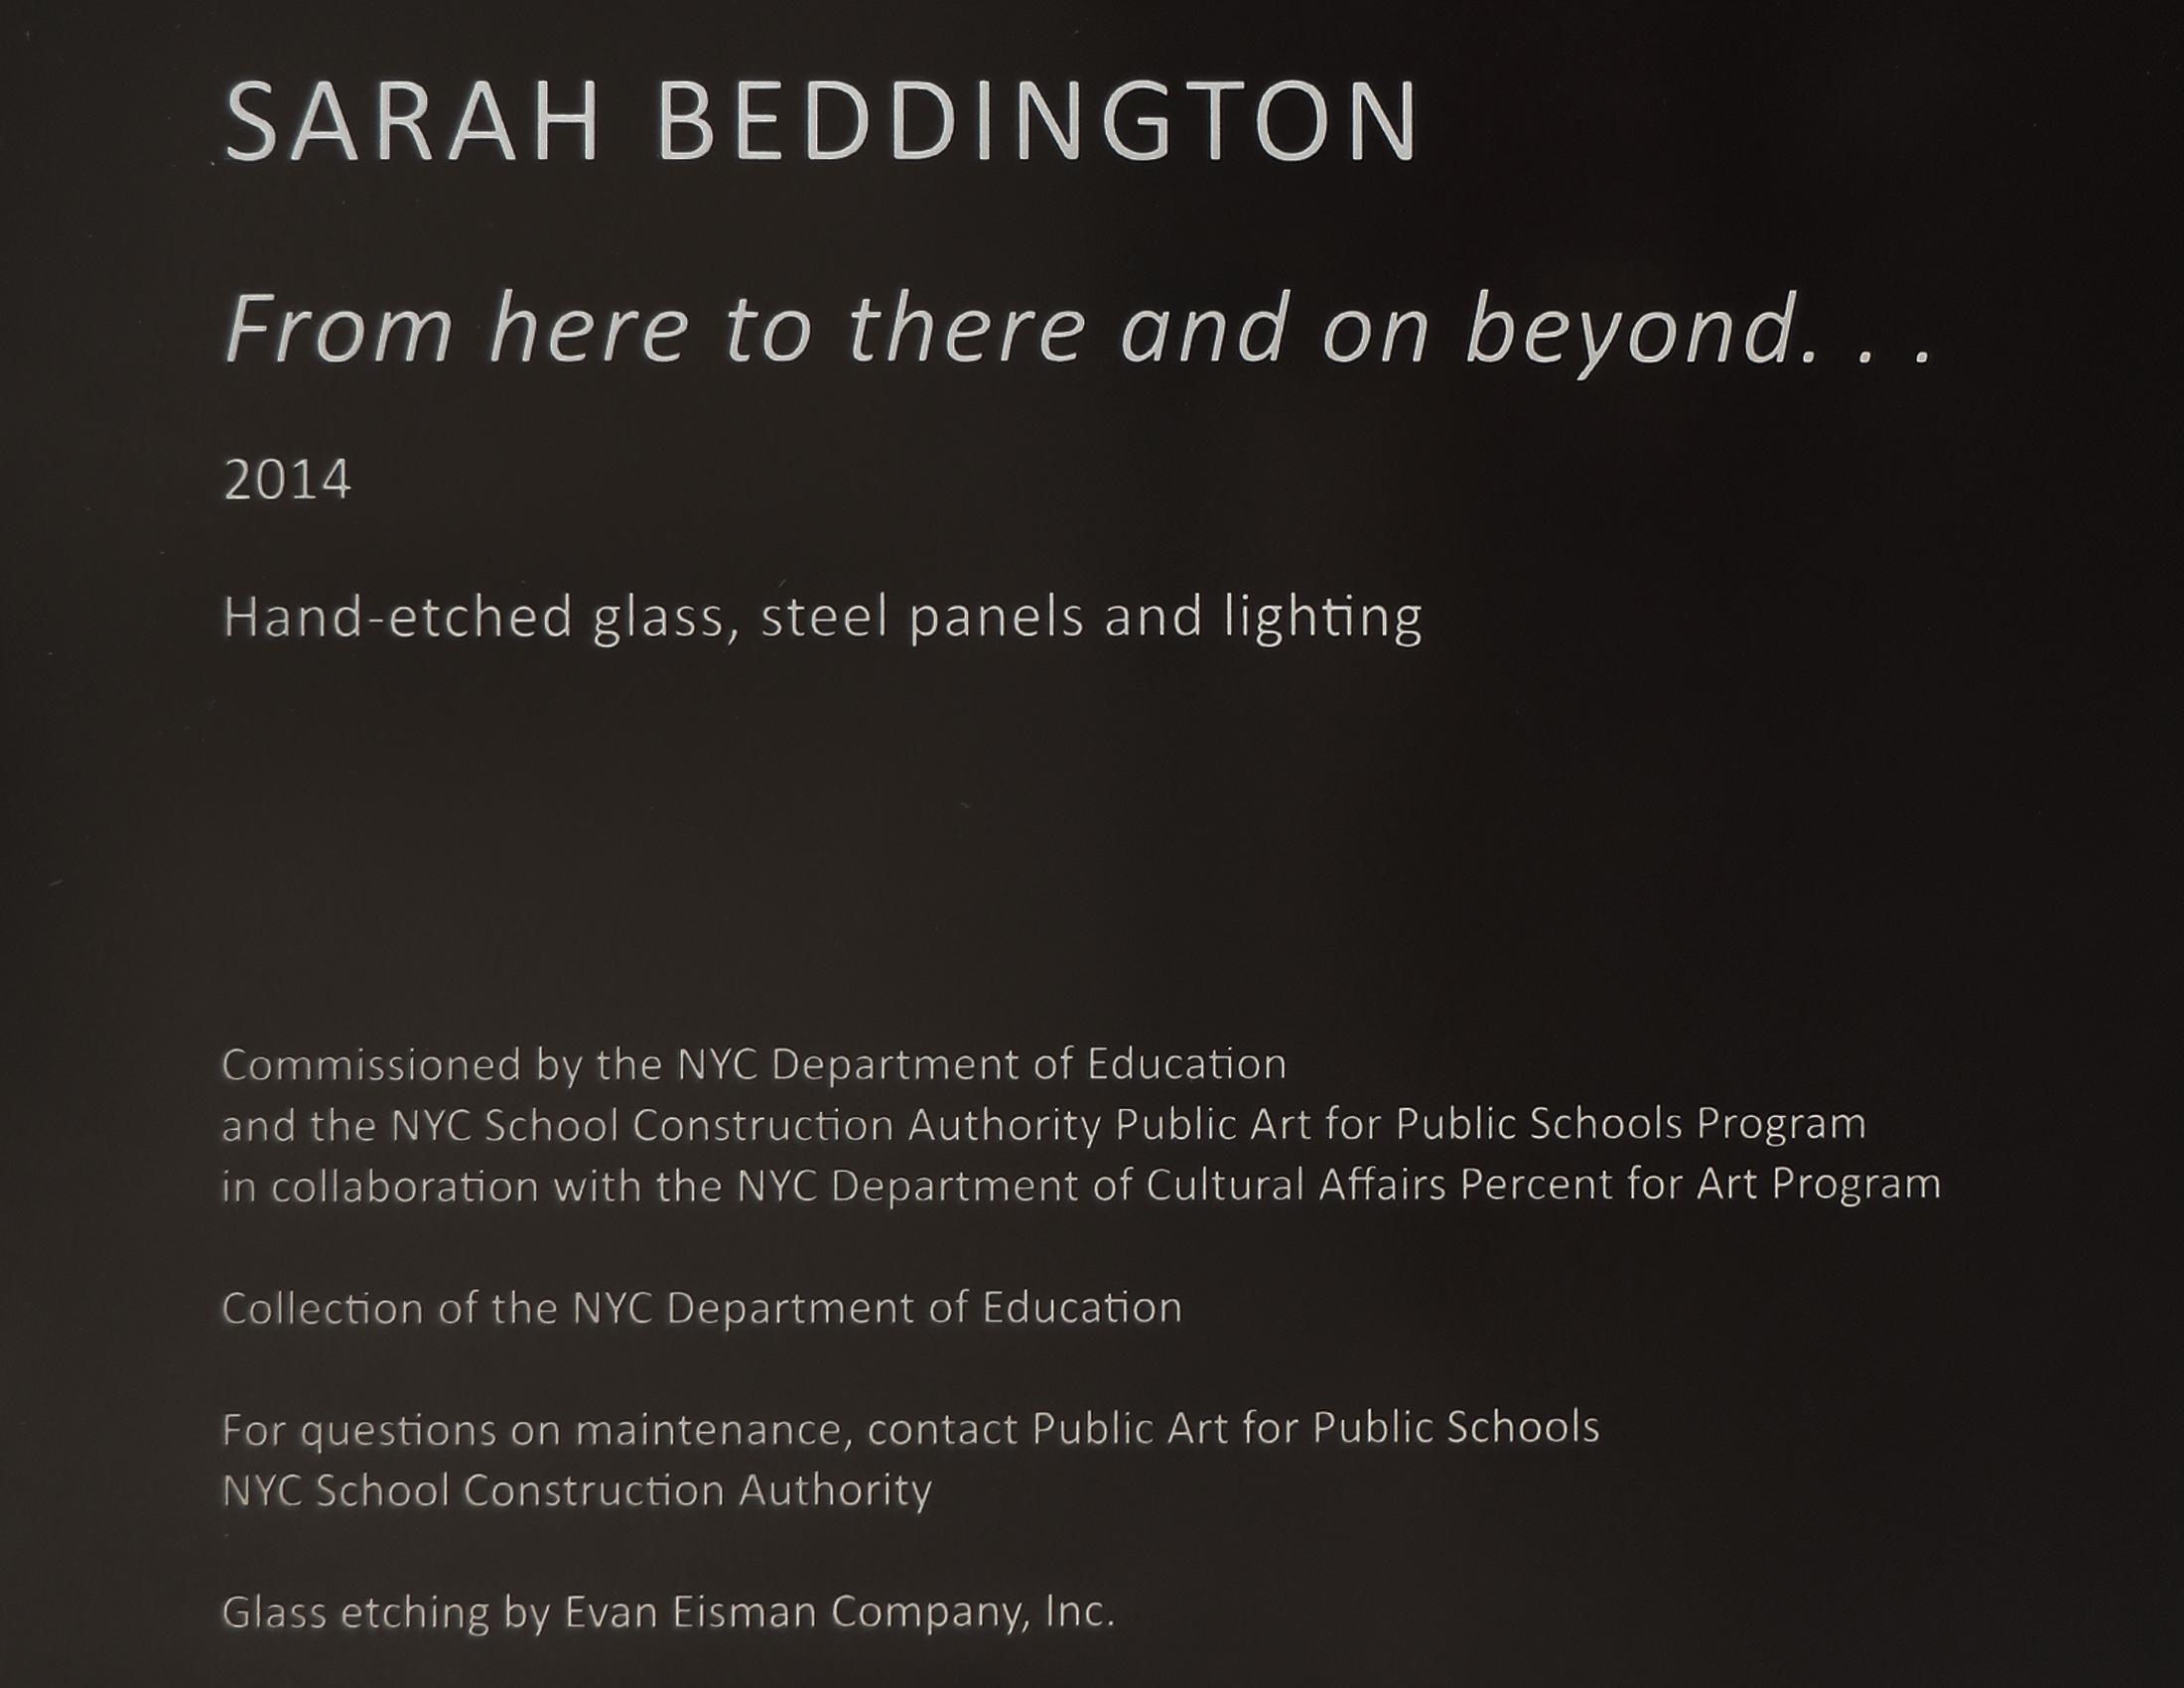 sarah_beddington_aluminum_plaque.jpg